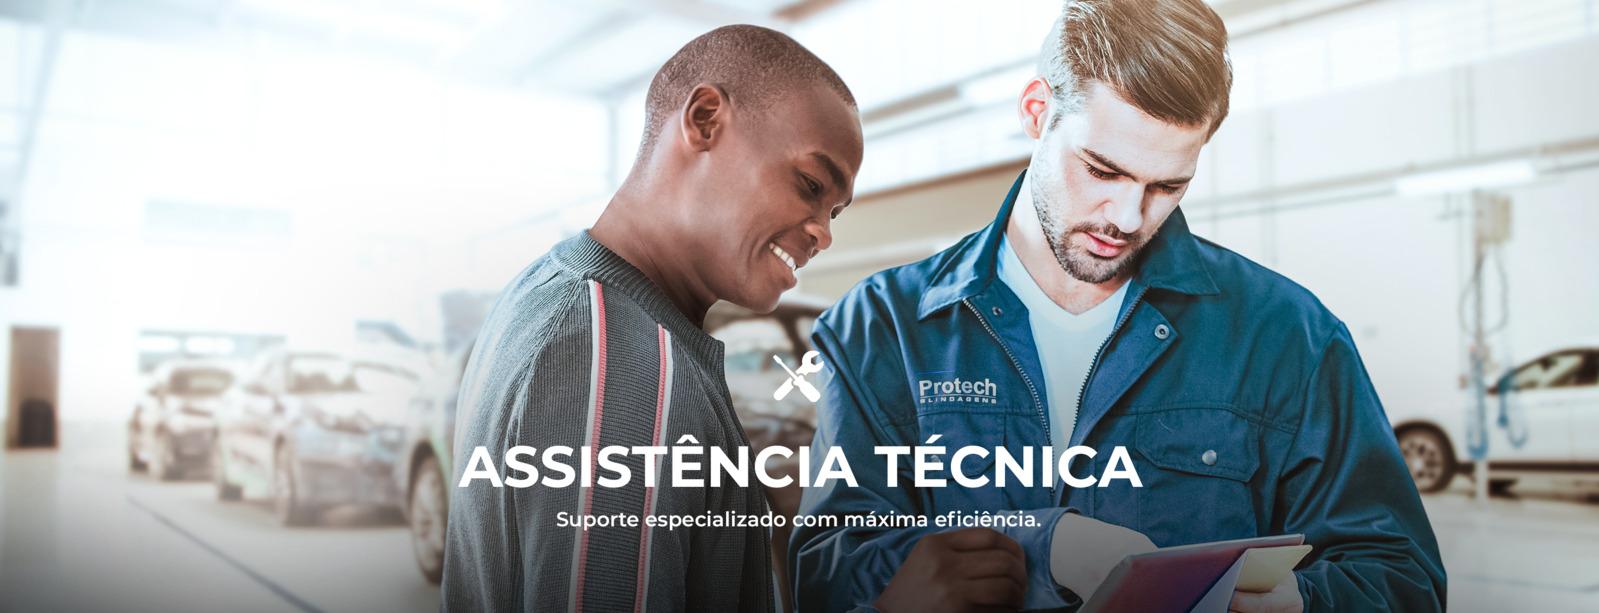 Assistencia Tecnica Banner 01 - Protech Blindagens